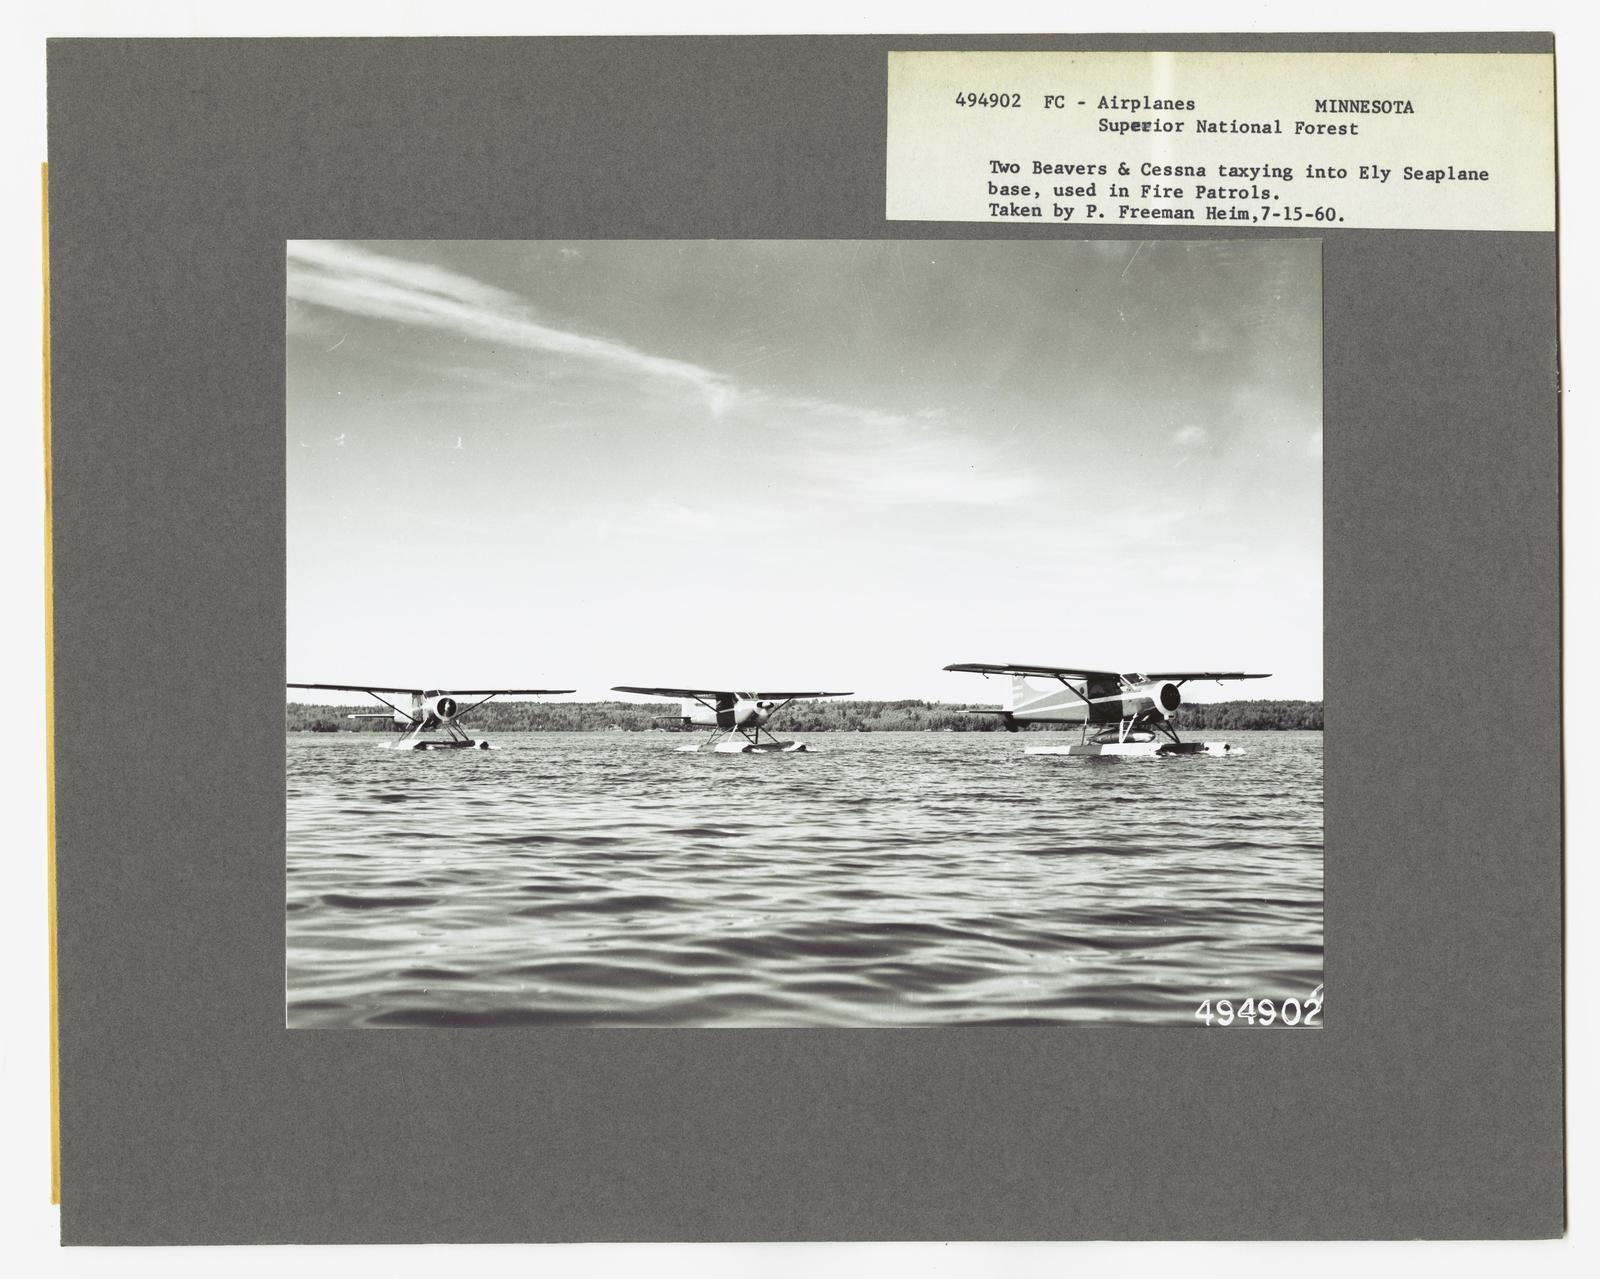 Aircraft and Airports - Minnesota